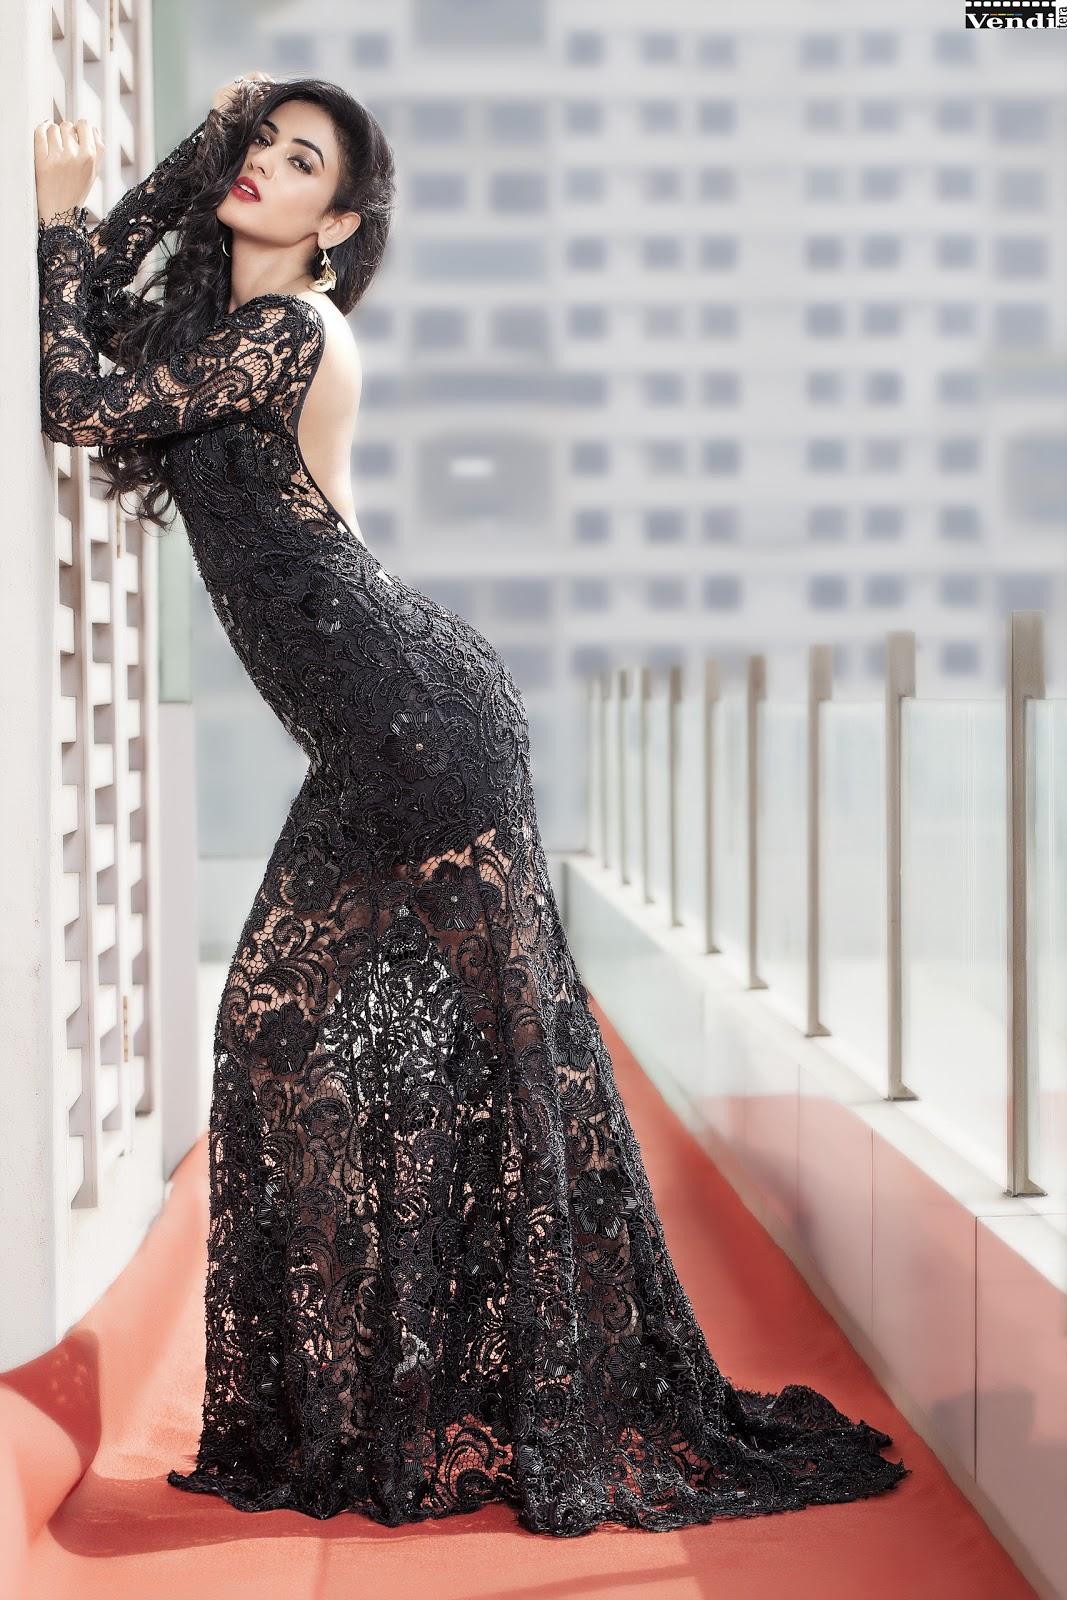 Bollywood Actress Sonal Chauhan Black Dress Hot Arousing Pics